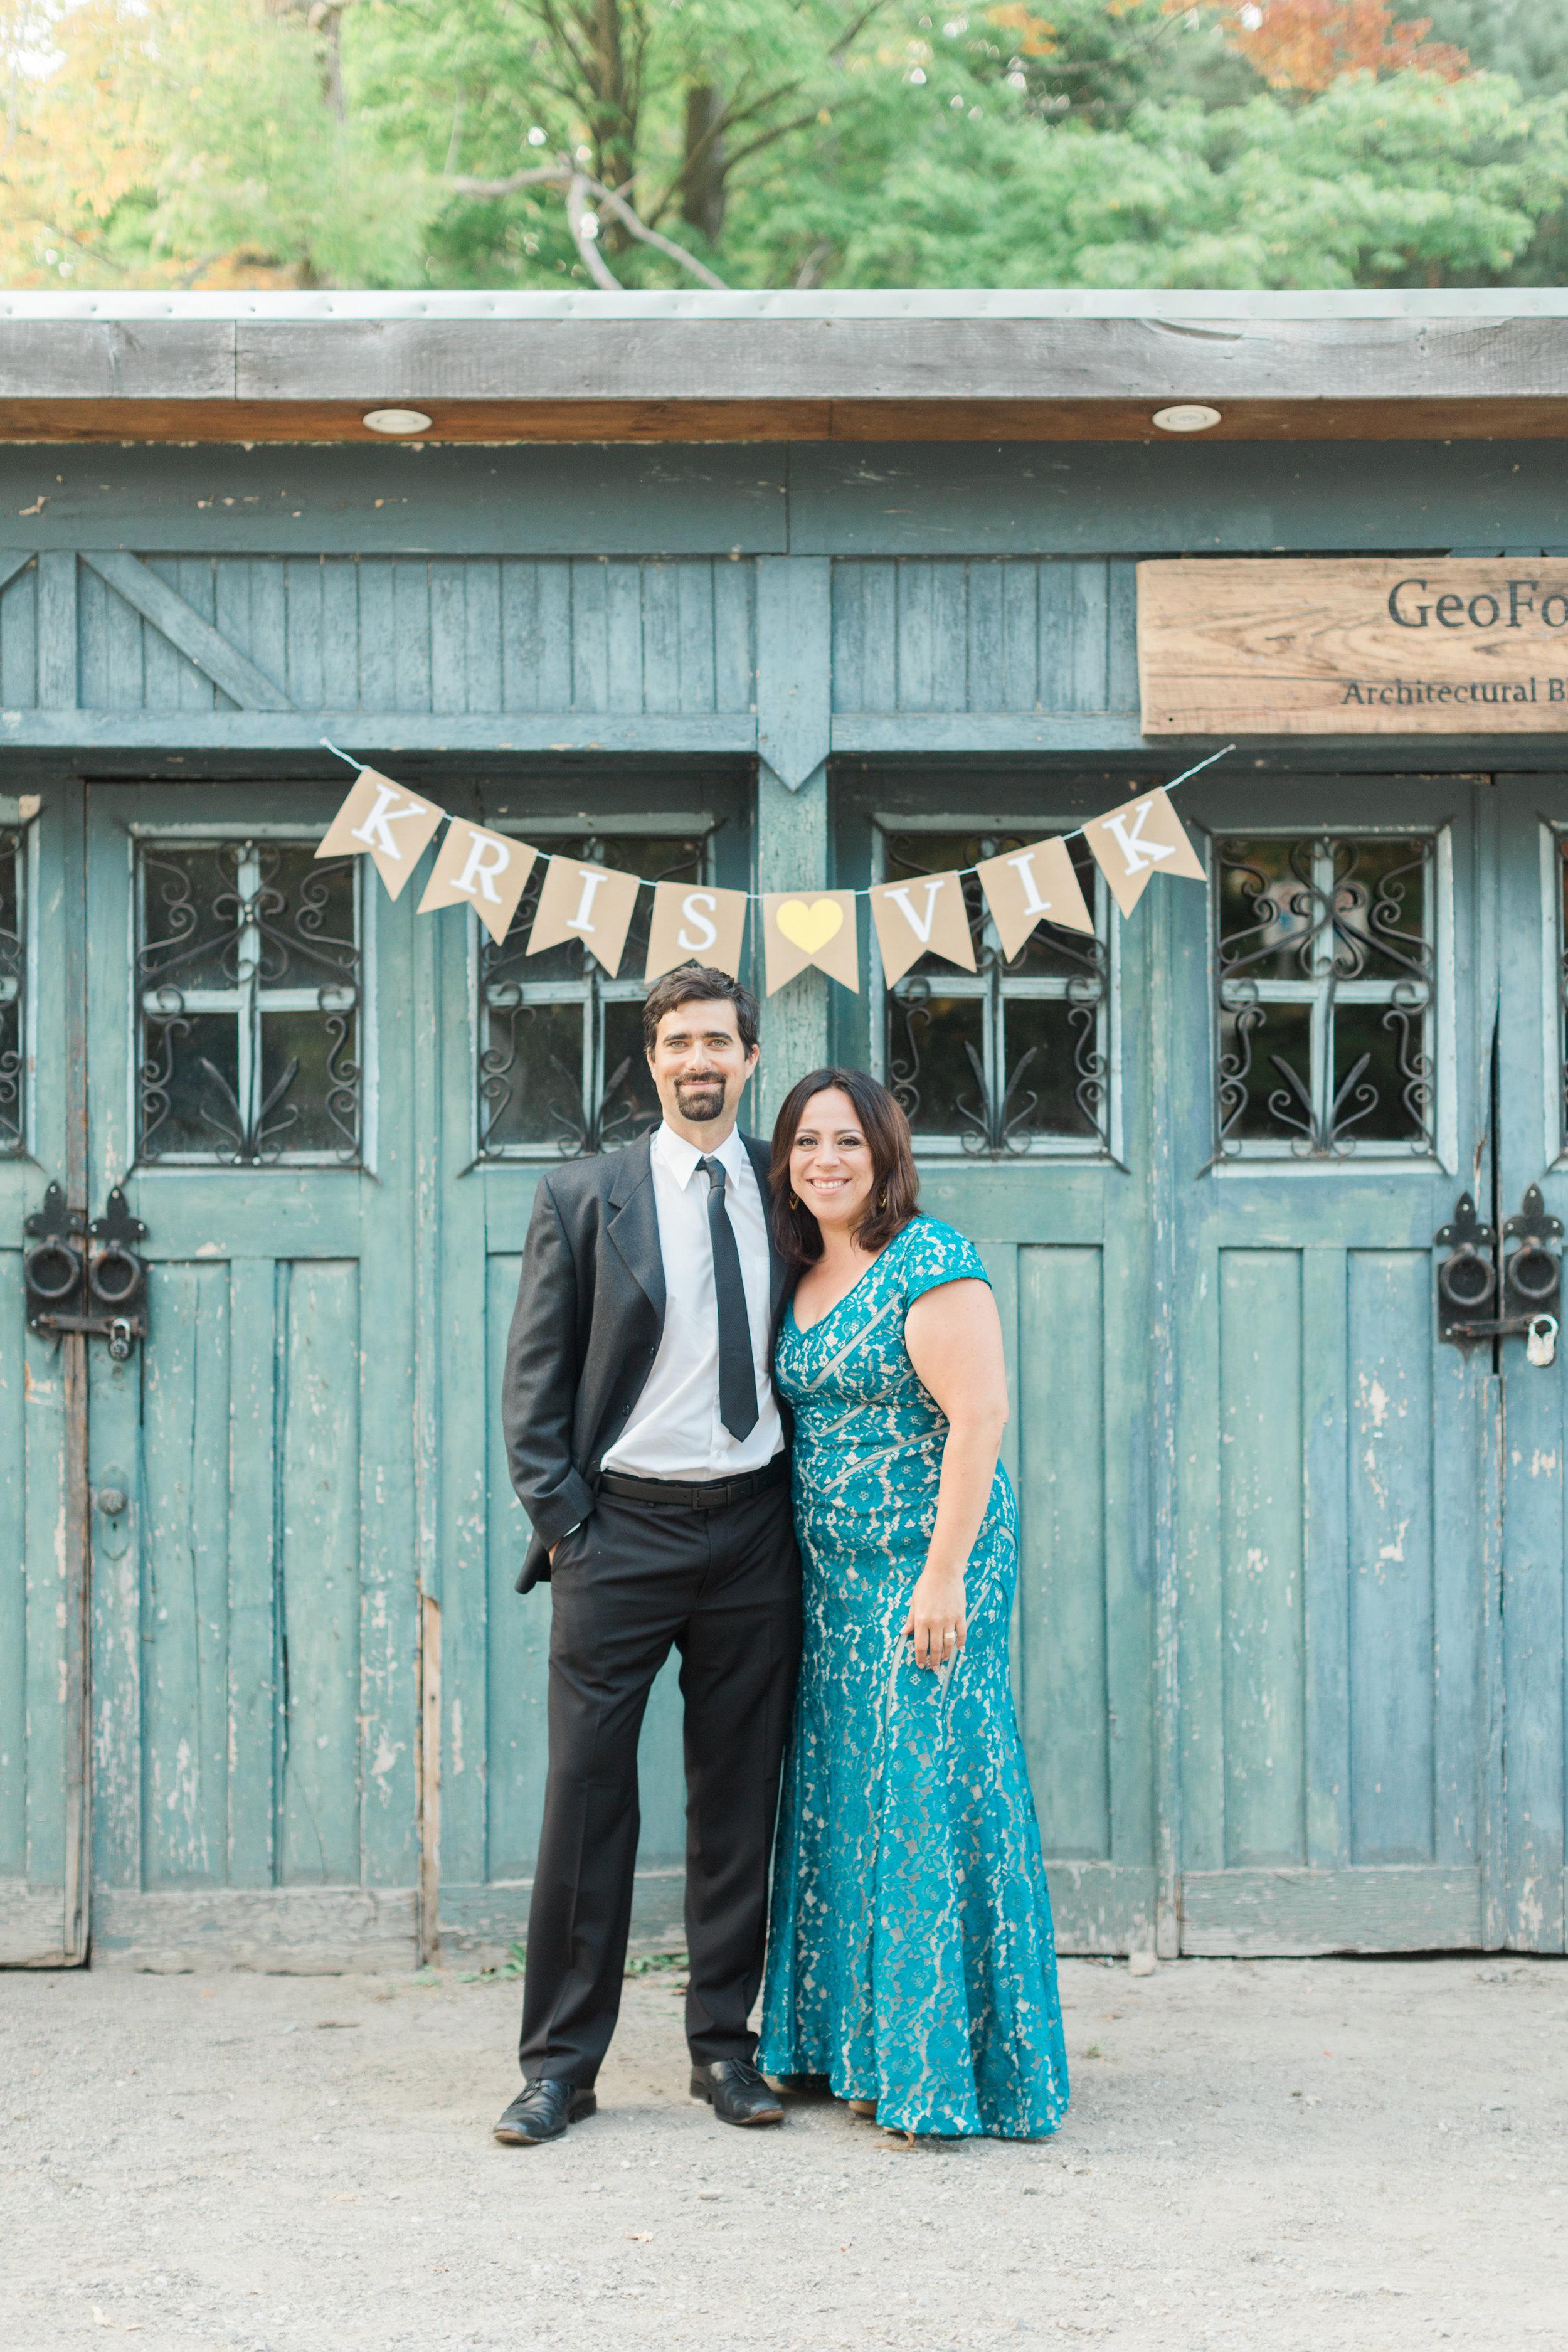 Alton Mills Wedding - Reception-13.jpg